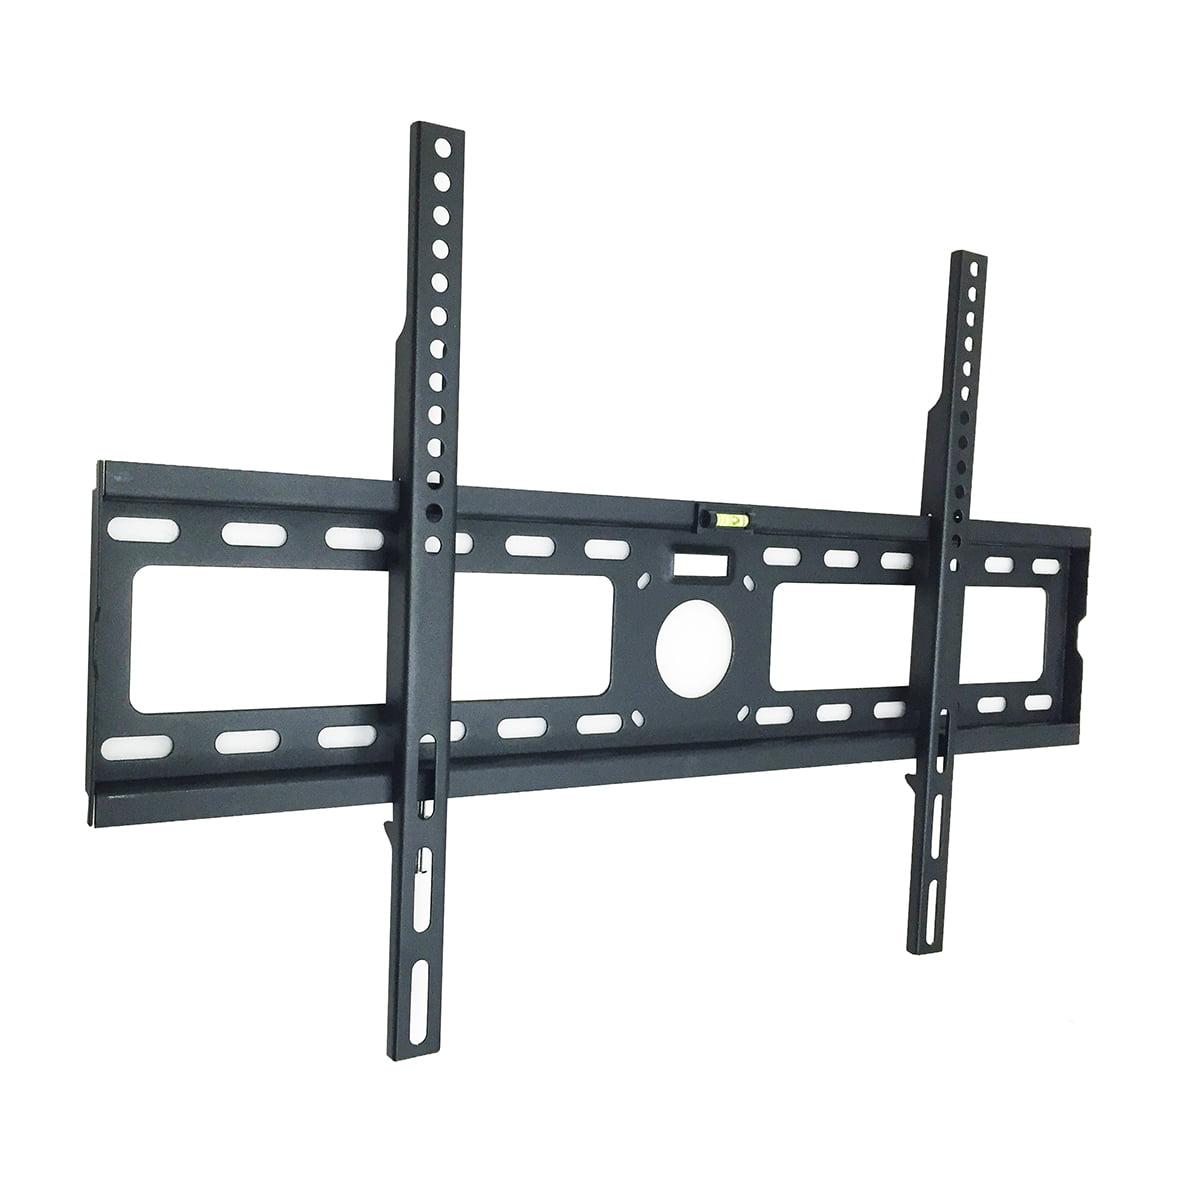 "Apontus TV Wall Mount Slim Flat 32"" - 65"" OLED LED LCD Flat Screen Bracket"